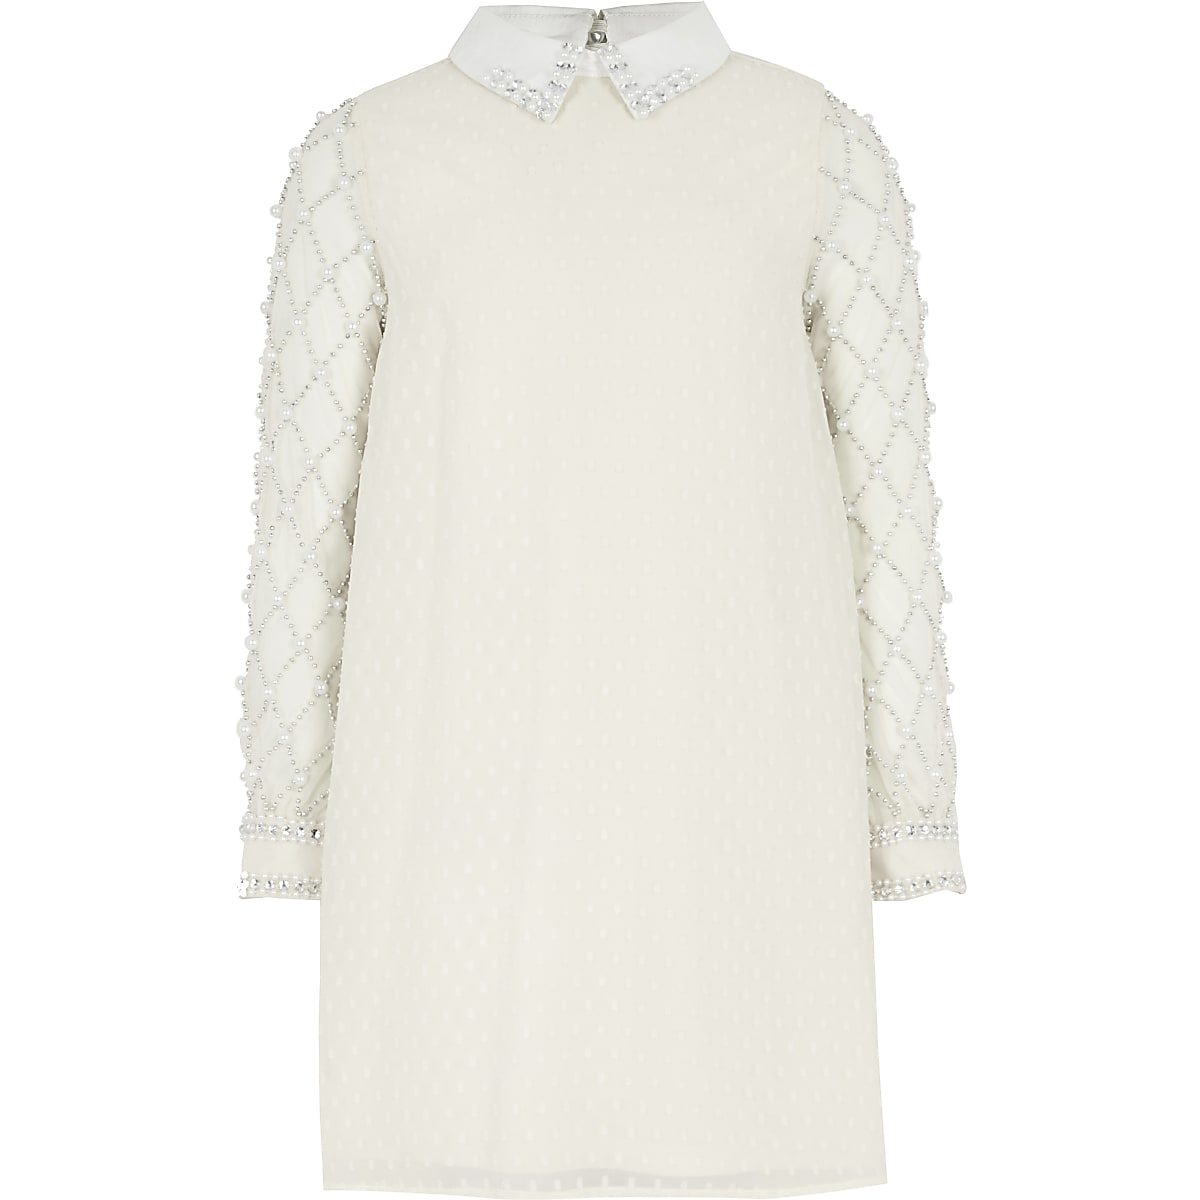 Crèmekleurige met nepparels verfraaide jurk voor meisjes